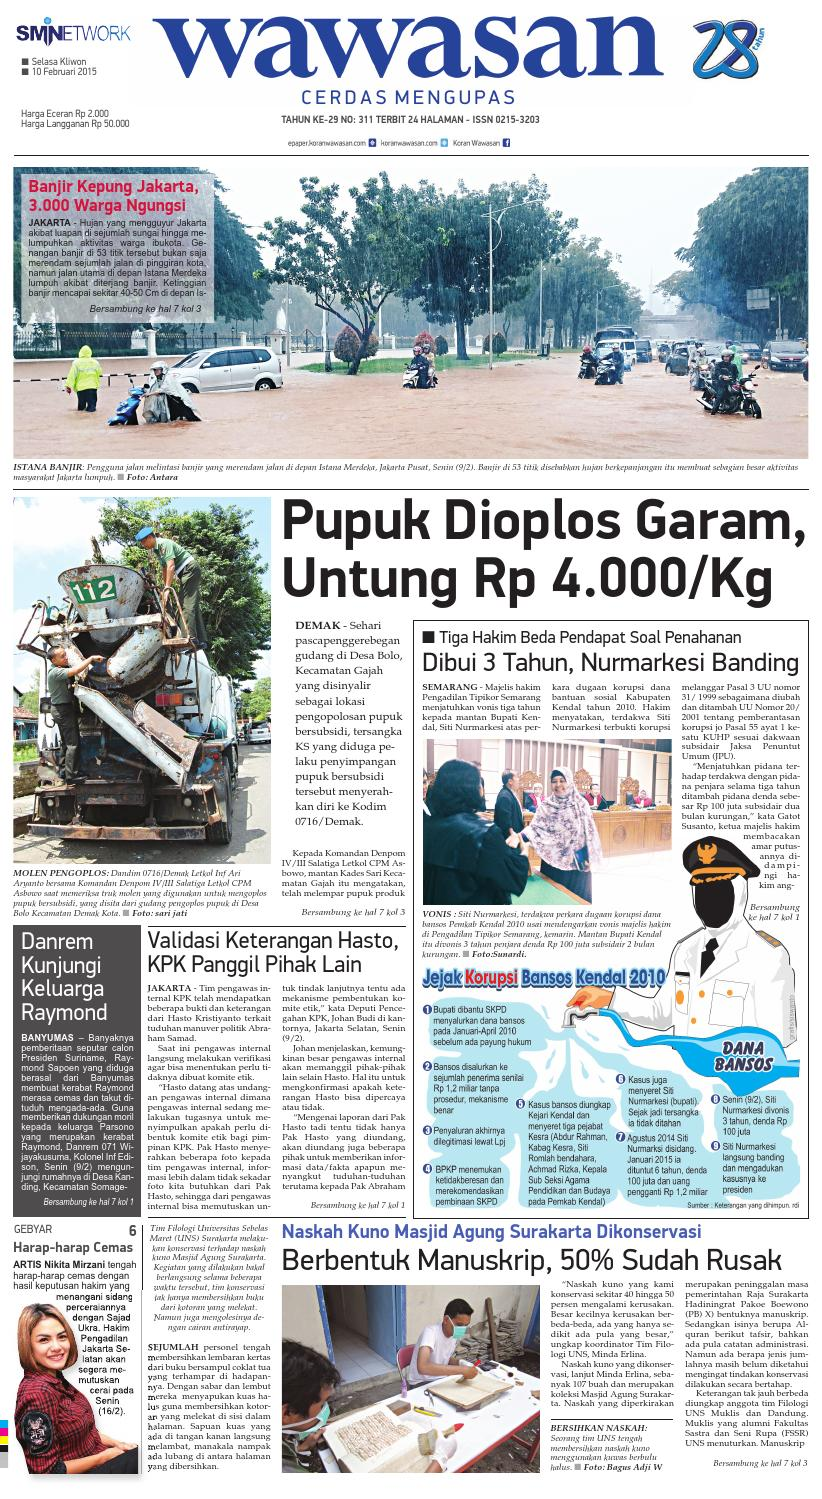 Wawasan 10 Februari 2015 By Koran Pagi Issuu Produk Ukm Bumn Tas Phiton Kombinasi Coklat Krem